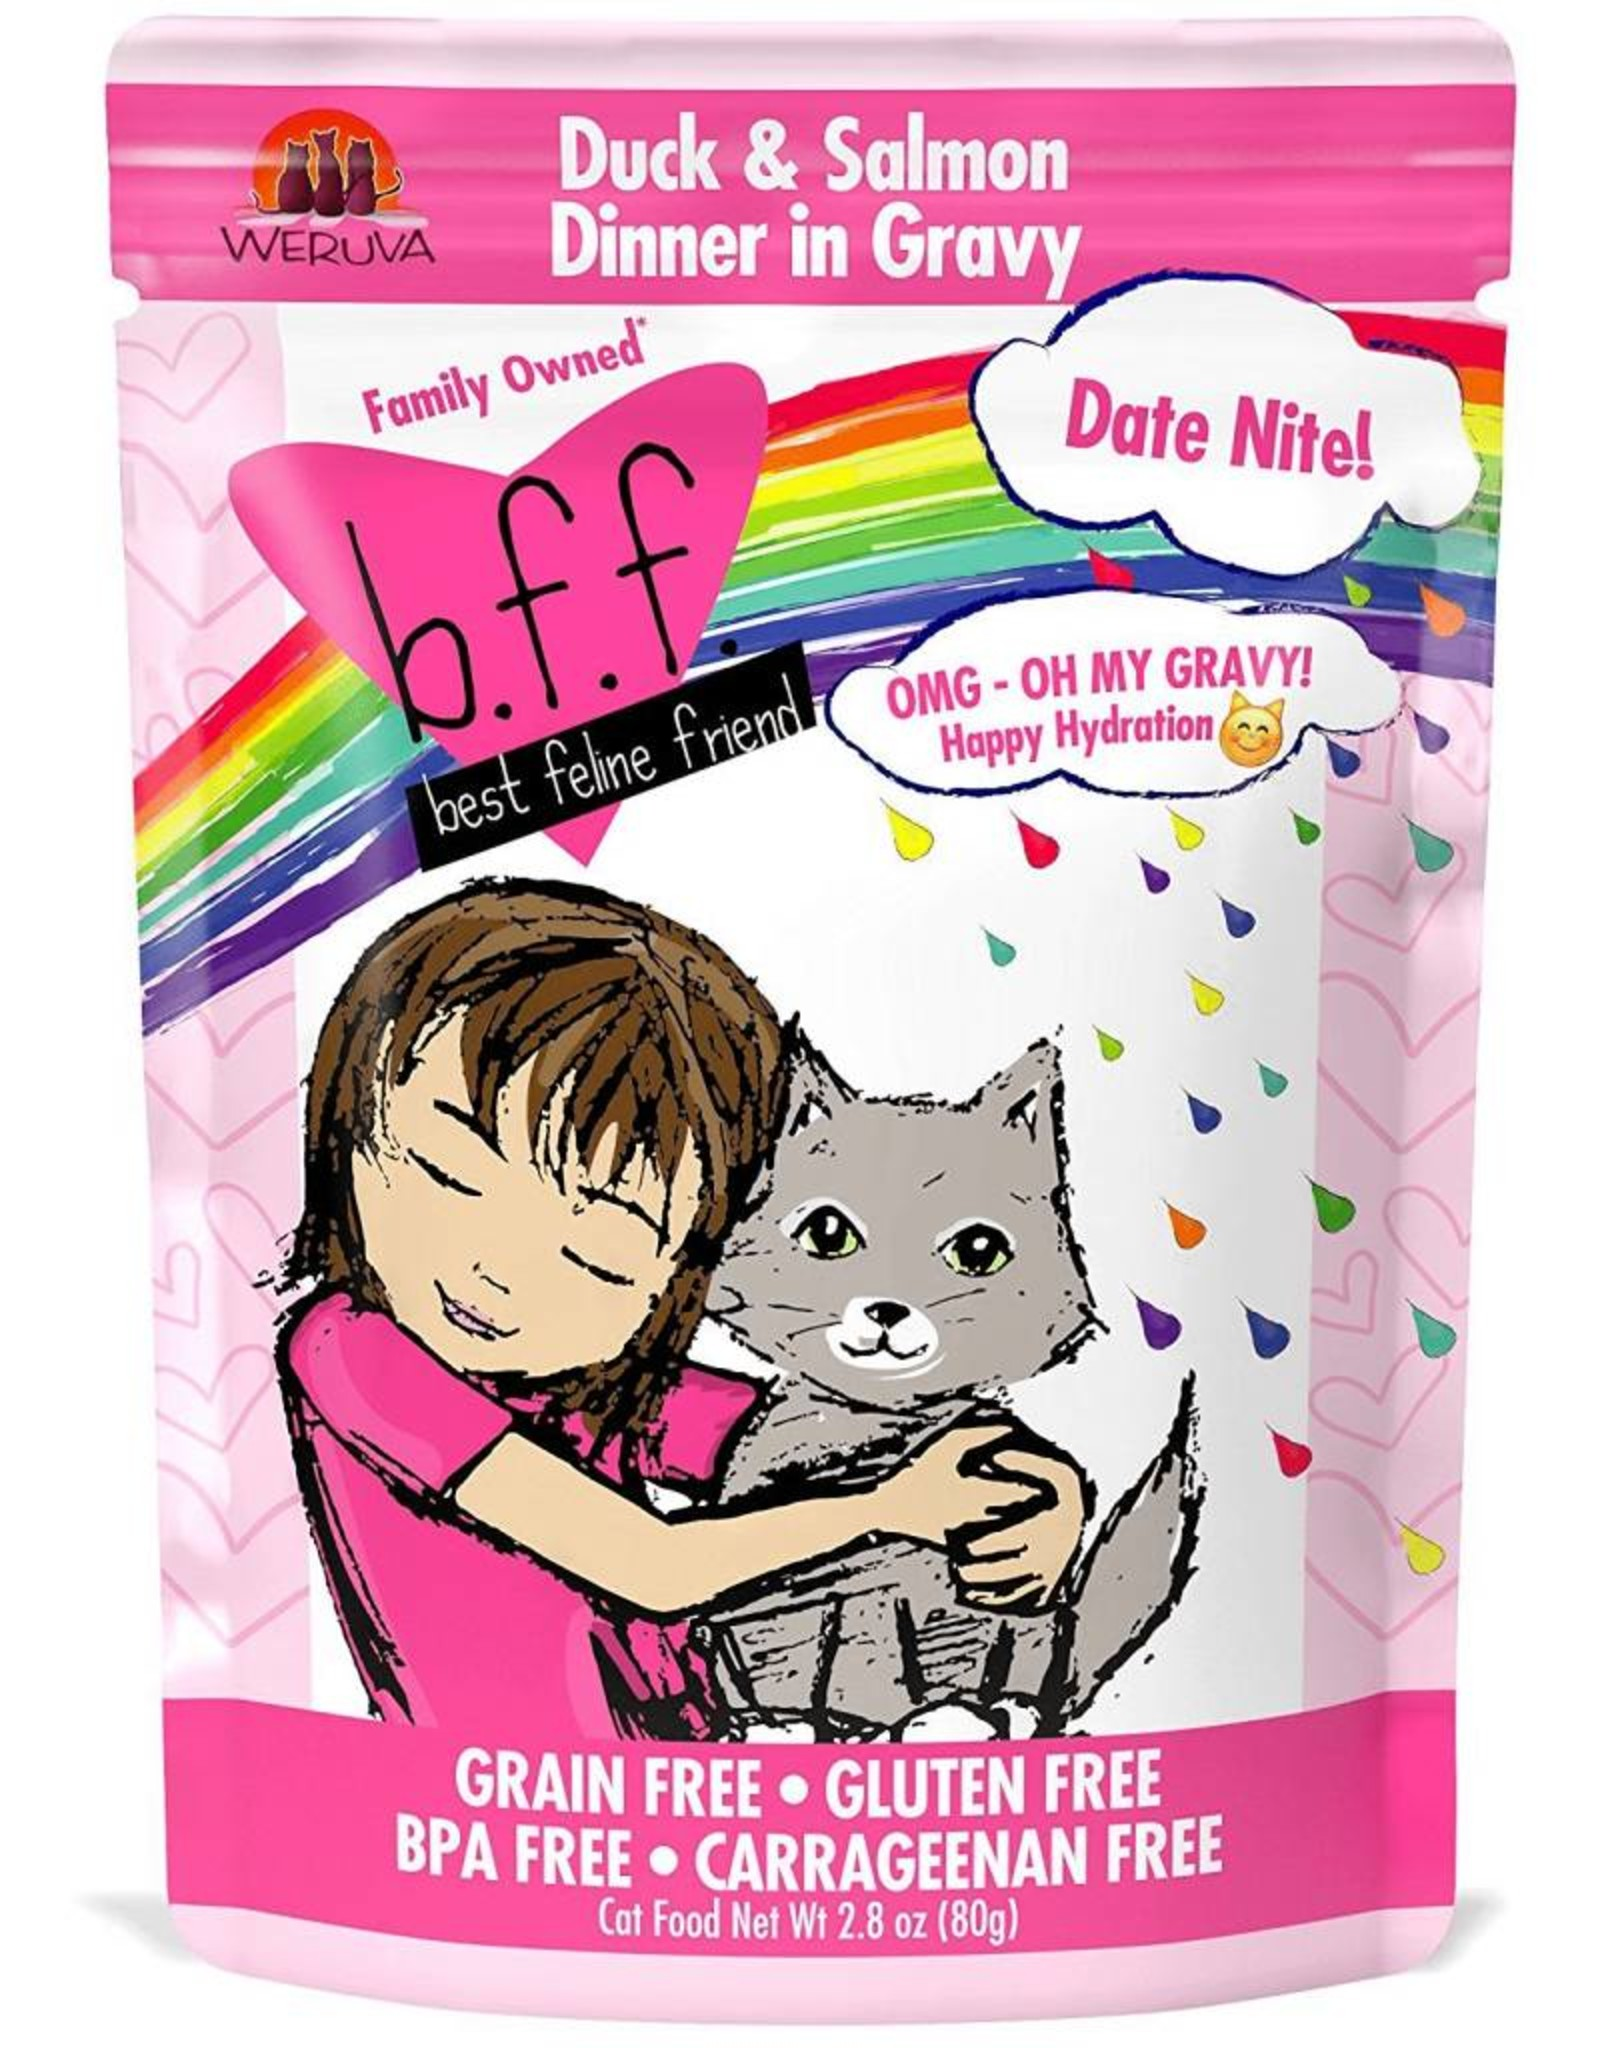 Weruva Weruva BFF OMG DATE NITE! DUCK AND SALMON CAT FOOD POUCH- 2.8 OZ.